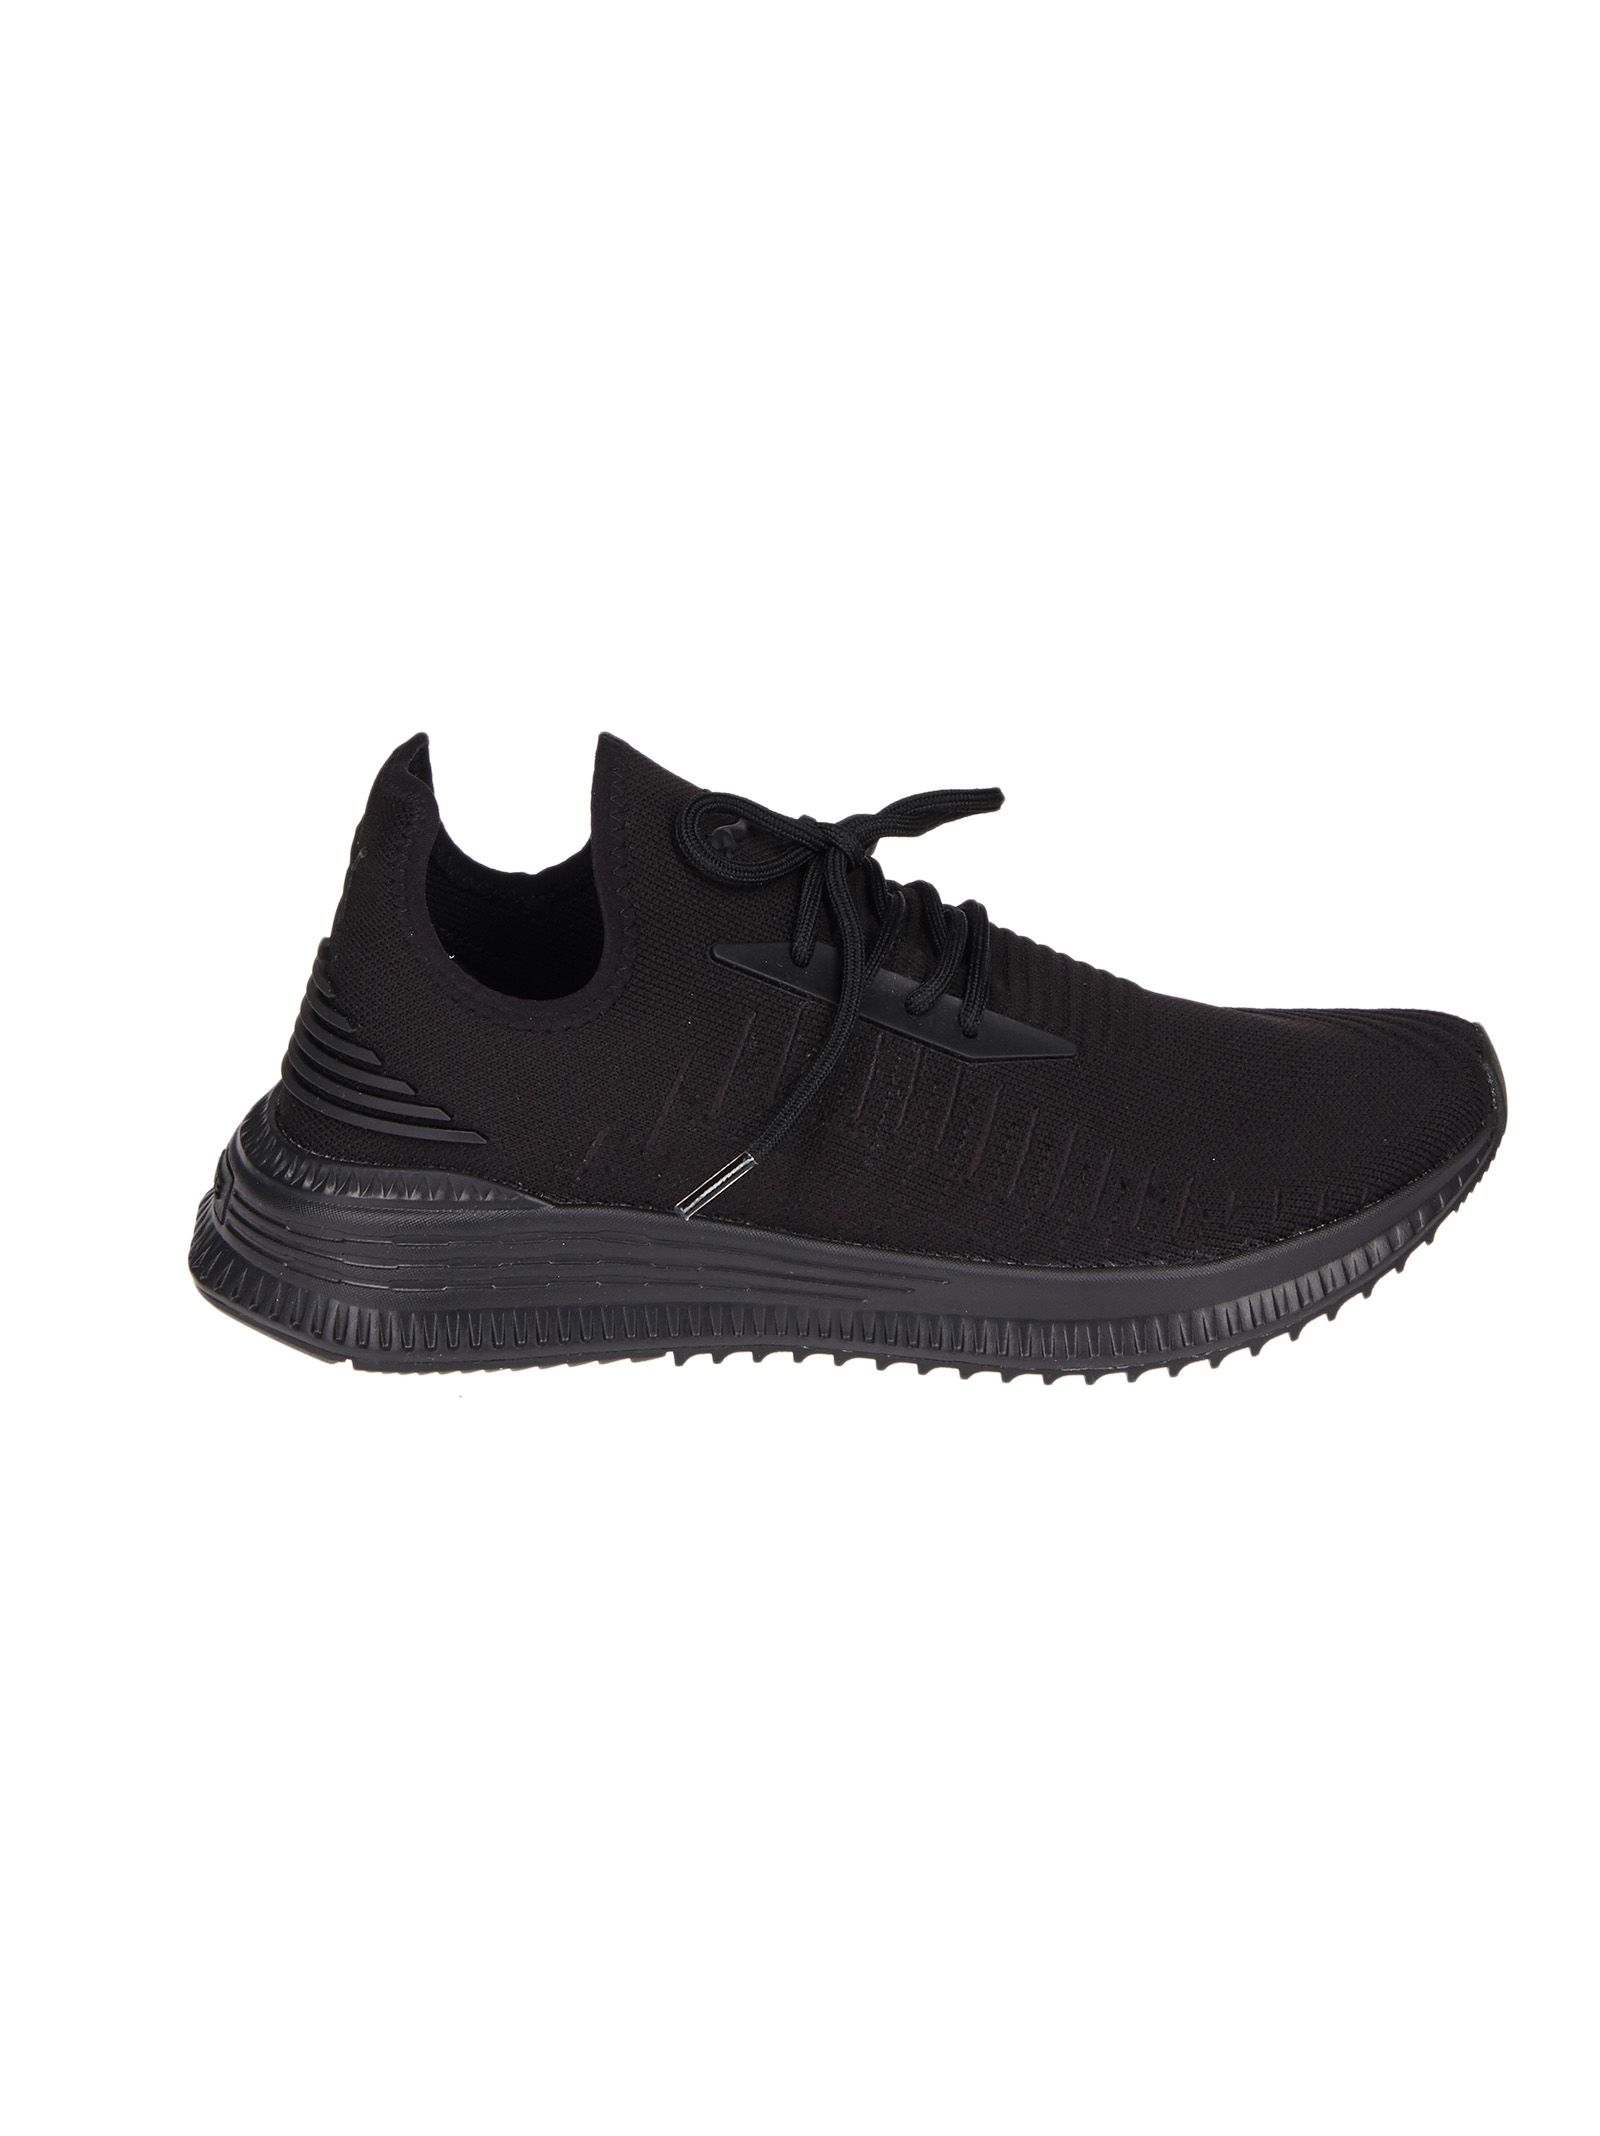 Puma Tsungi-mi Evoknit Sneakers